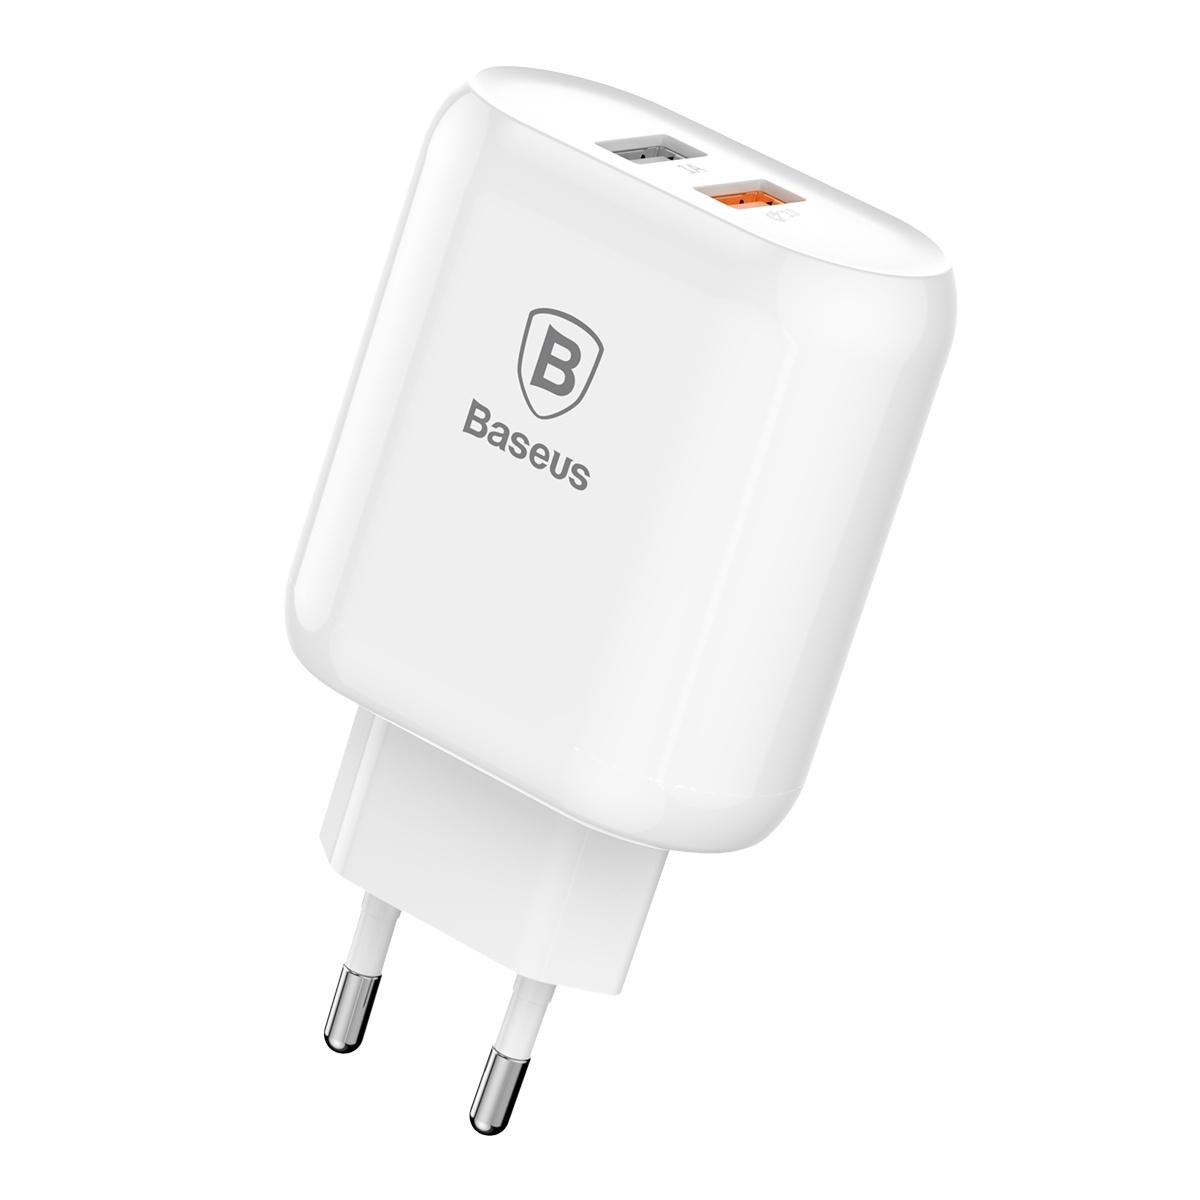 Cốc sạc nhanh Baseus Bojure Series Dual-USB 23W 1